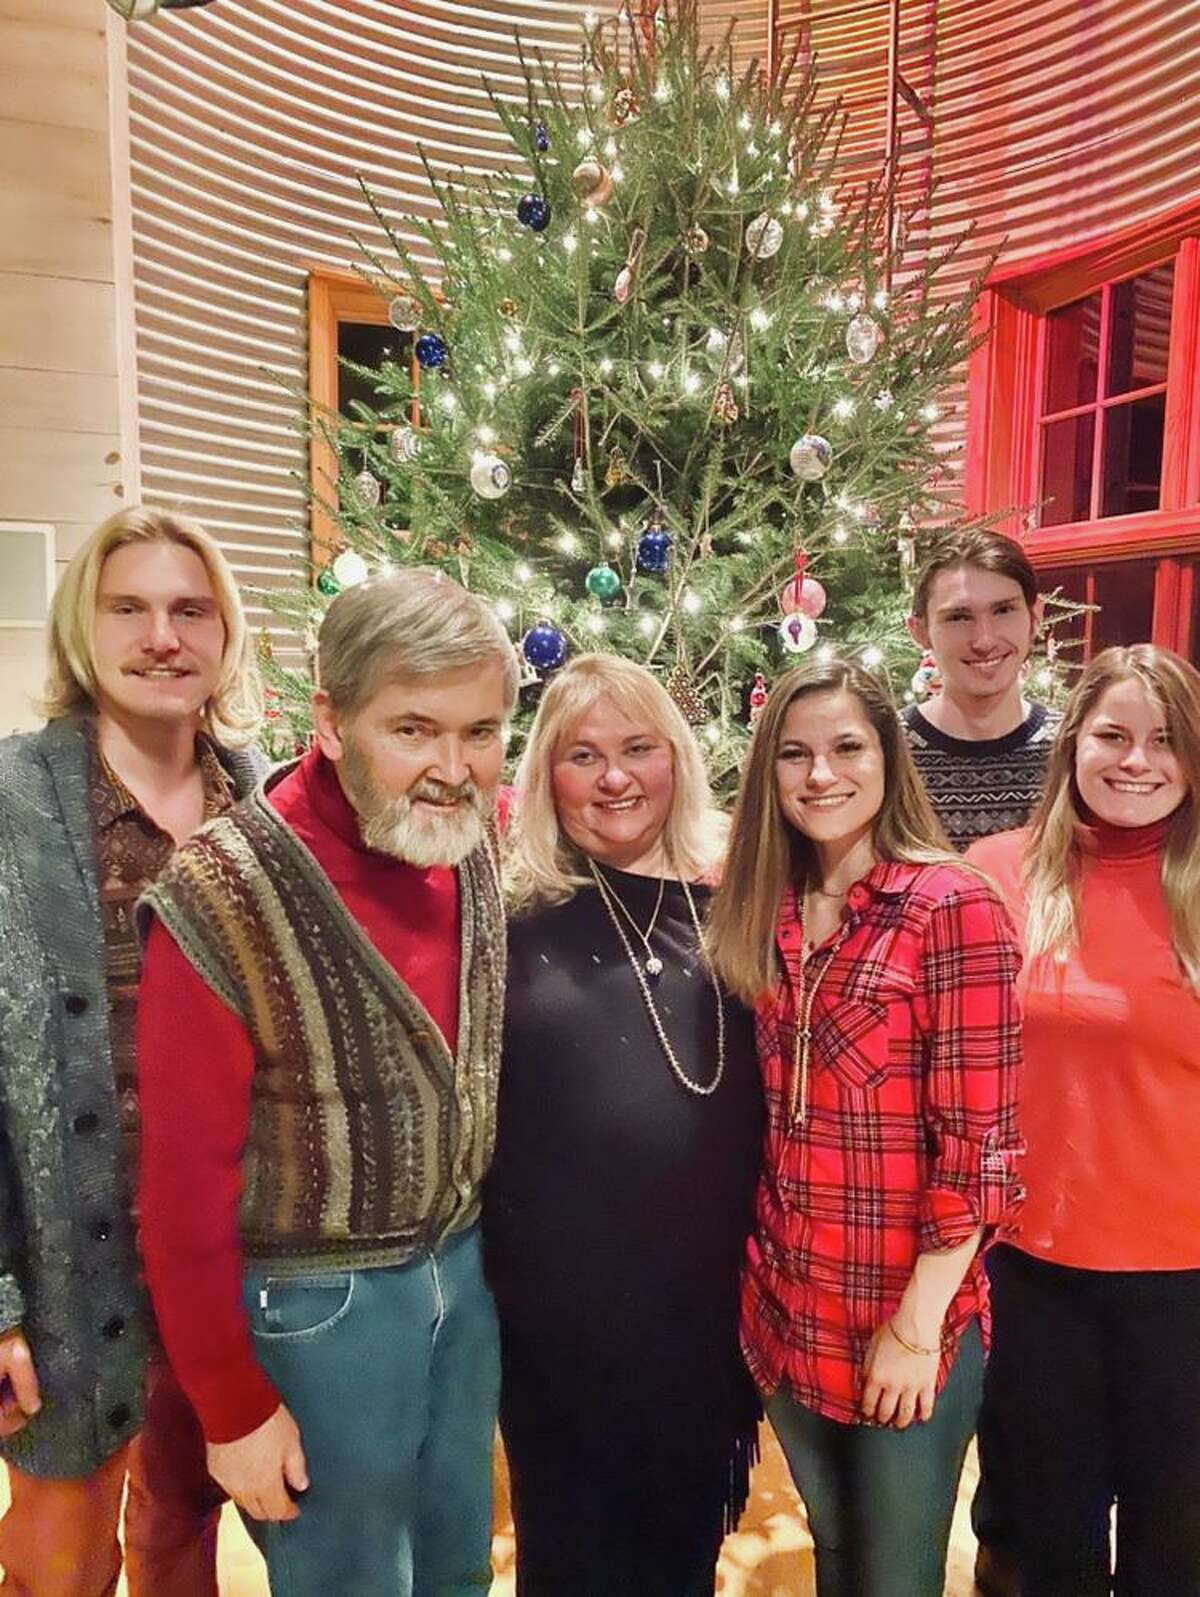 Jonas, Ed Schmidt, Georgia, Marya, Seth, and Darya von Schmidt. The rest of the family goes by